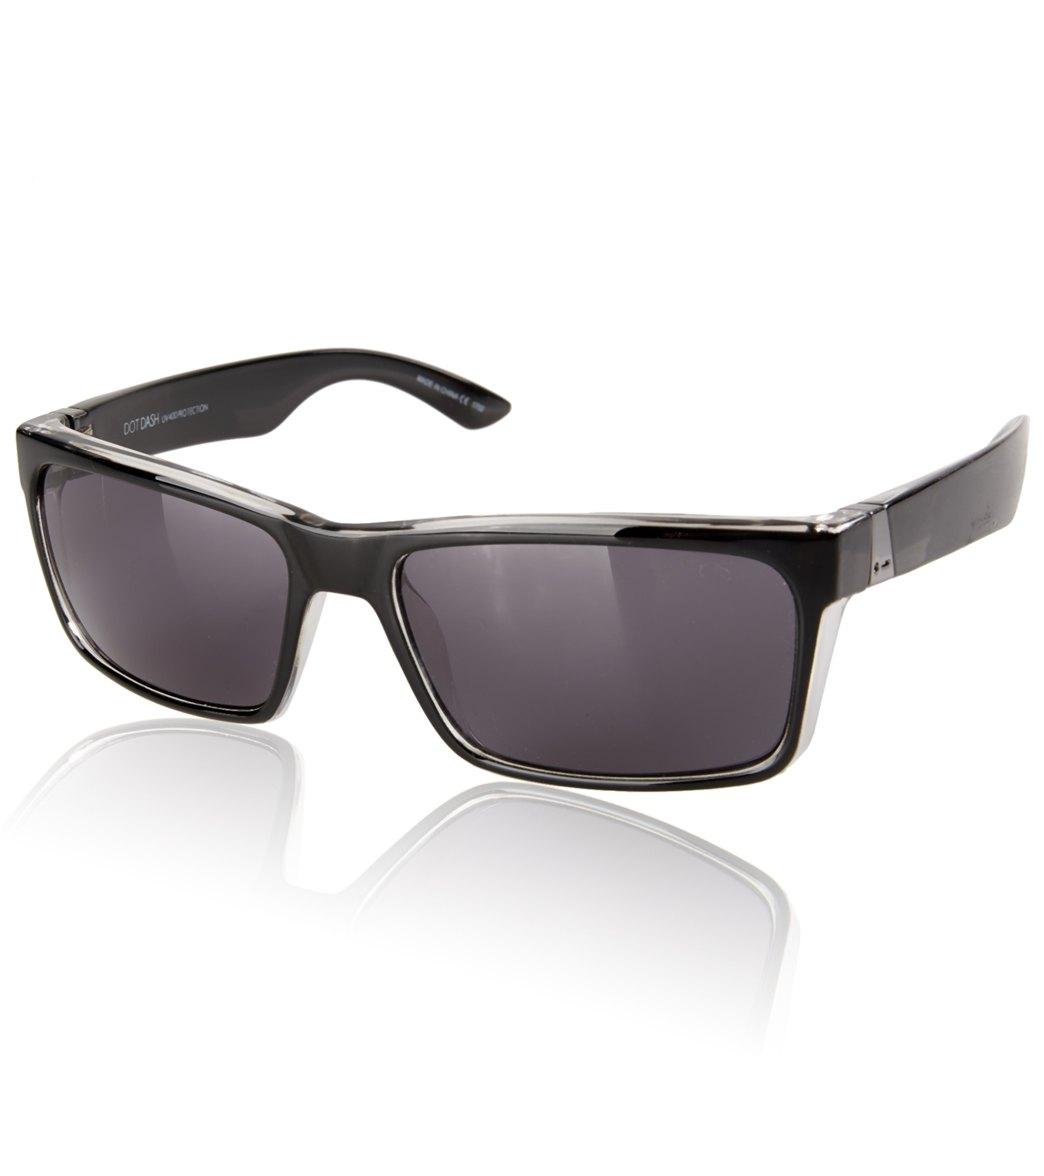 72ed85dcfc6 Dot Dash Lads Polarized Sunglasses at SwimOutlet.com